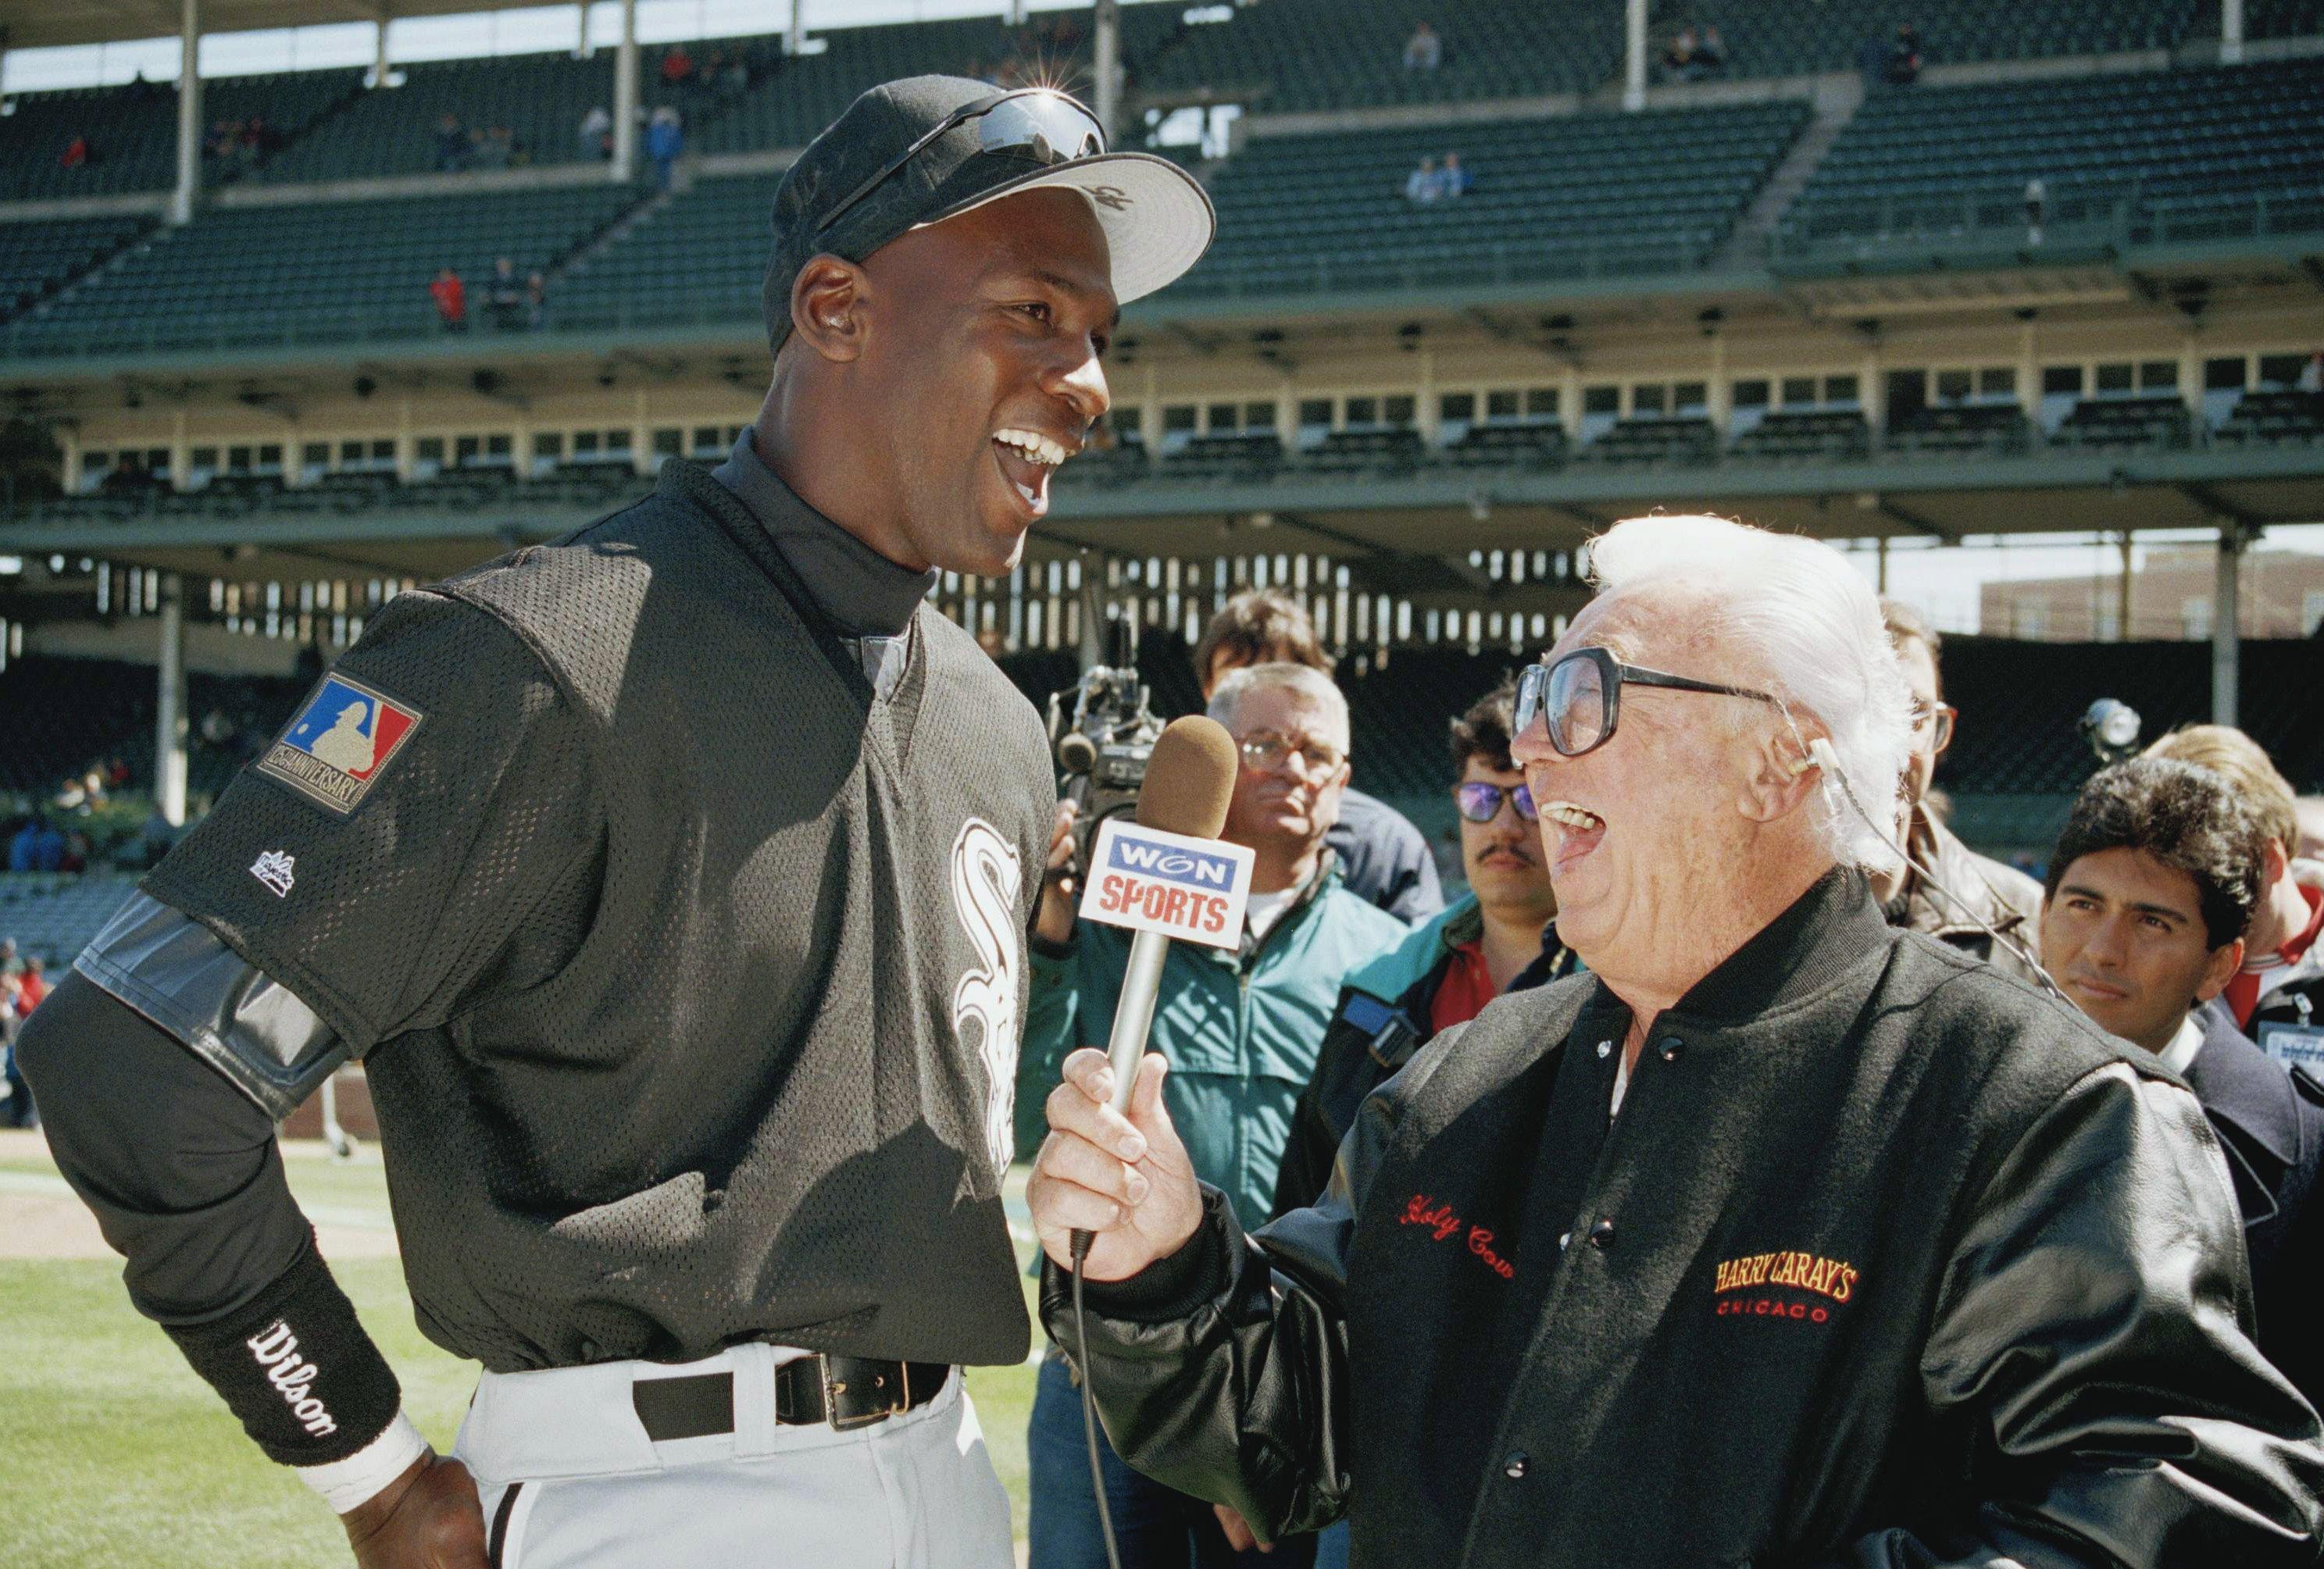 algas marinas barba Cumplir  Michael Jordan's Baseball Career Stats, Struggles, Highlights and Reaction  | Bleacher Report | Latest News, Videos and Highlights